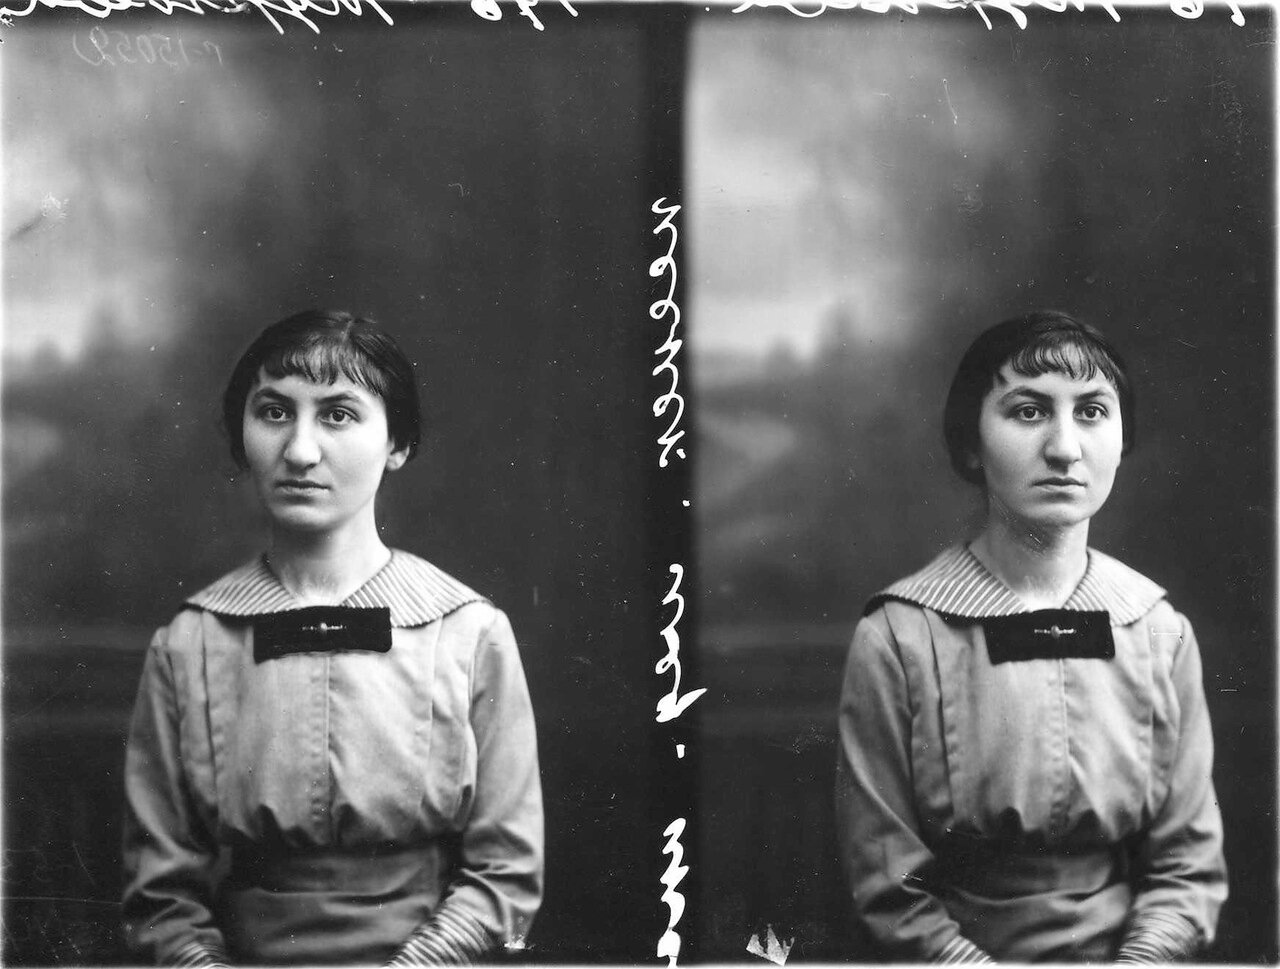 Турнева - студентка женского медицинского института